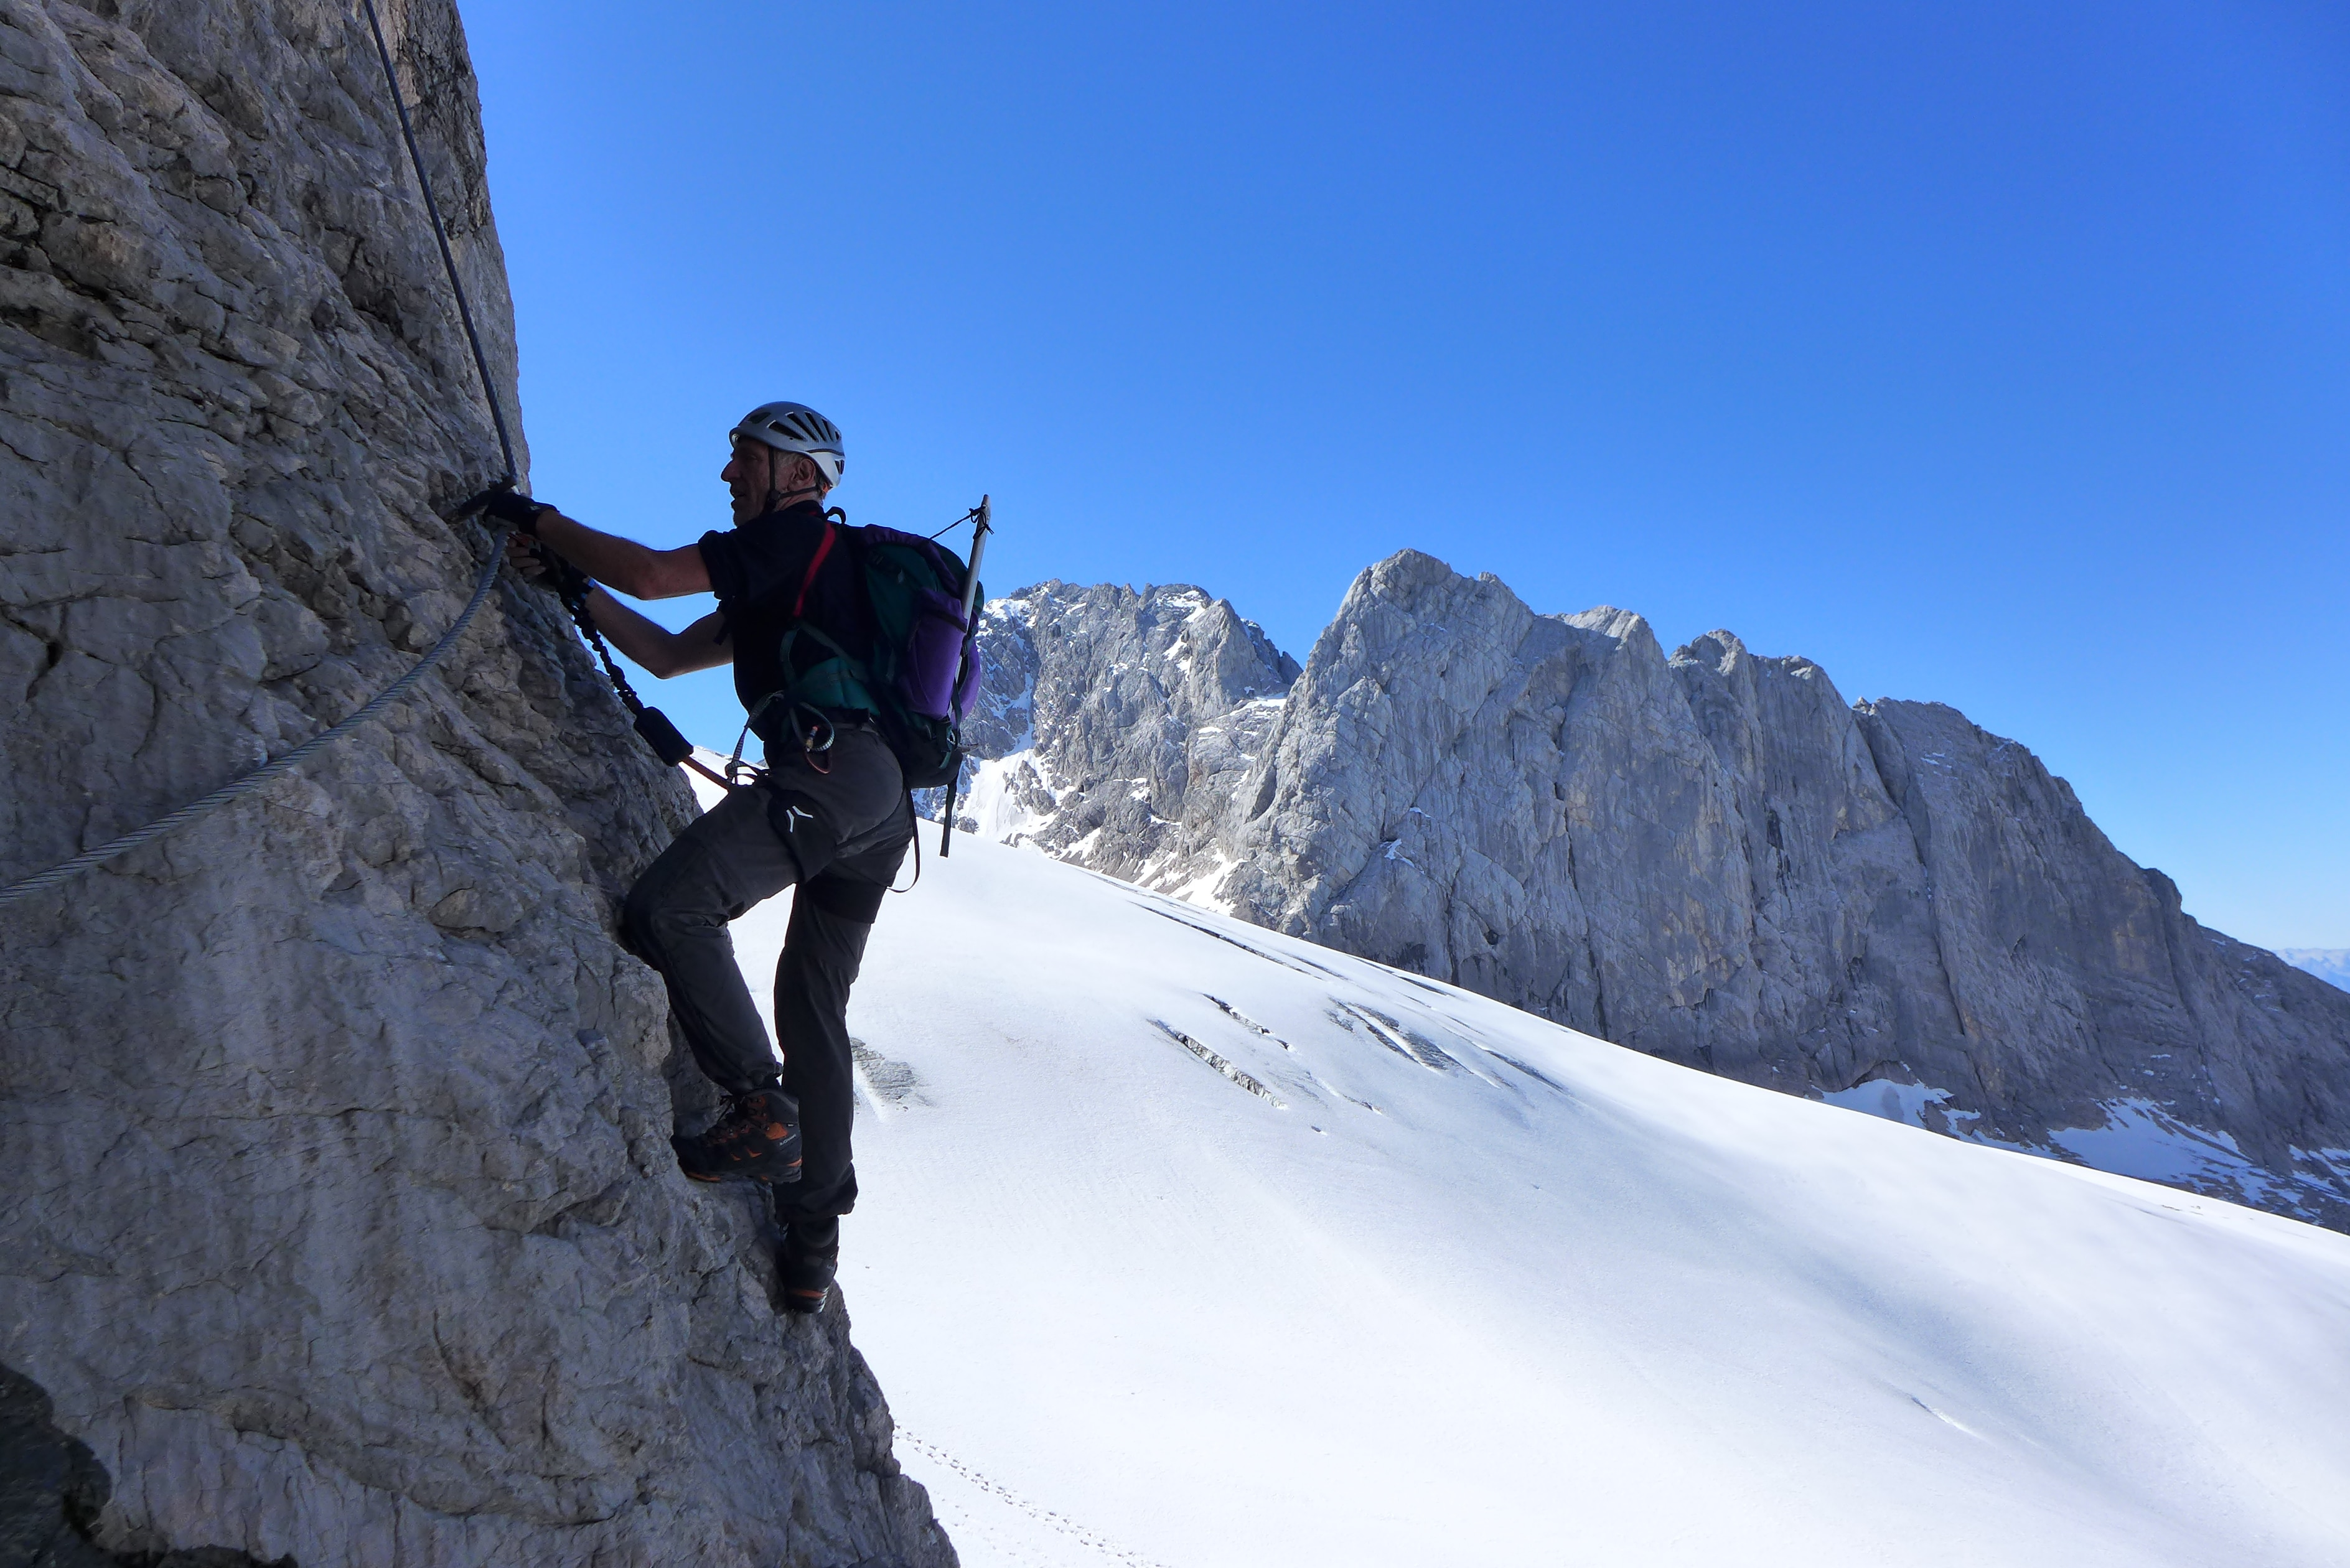 Klettersteig Rakousko : Klettersteige amon klettersteig km bergwelten